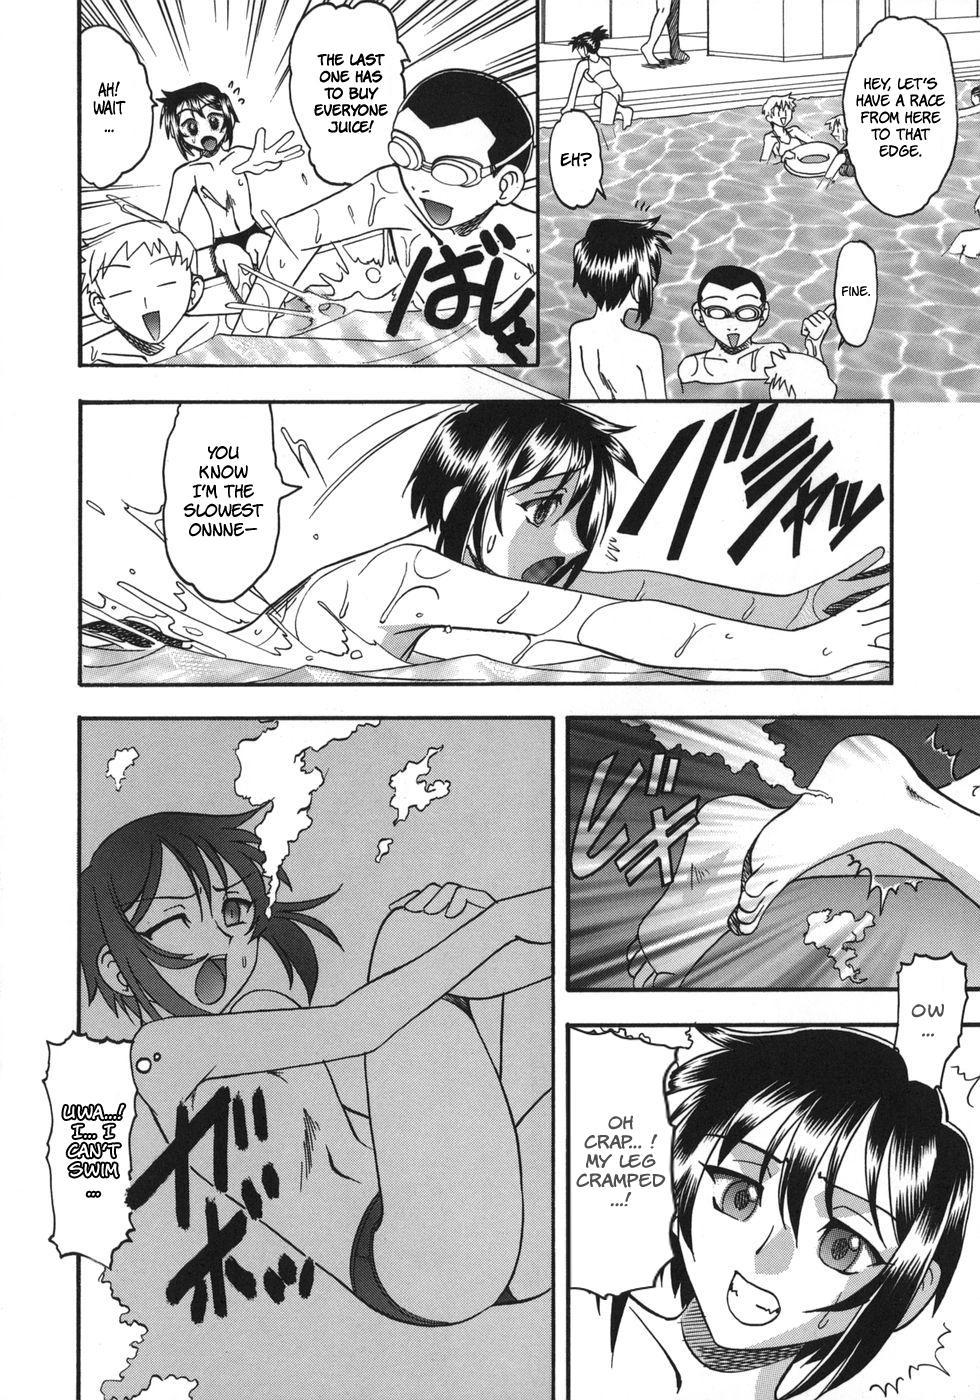 Hadaka Yori Hiwai - She is dirtier than nakedness 149